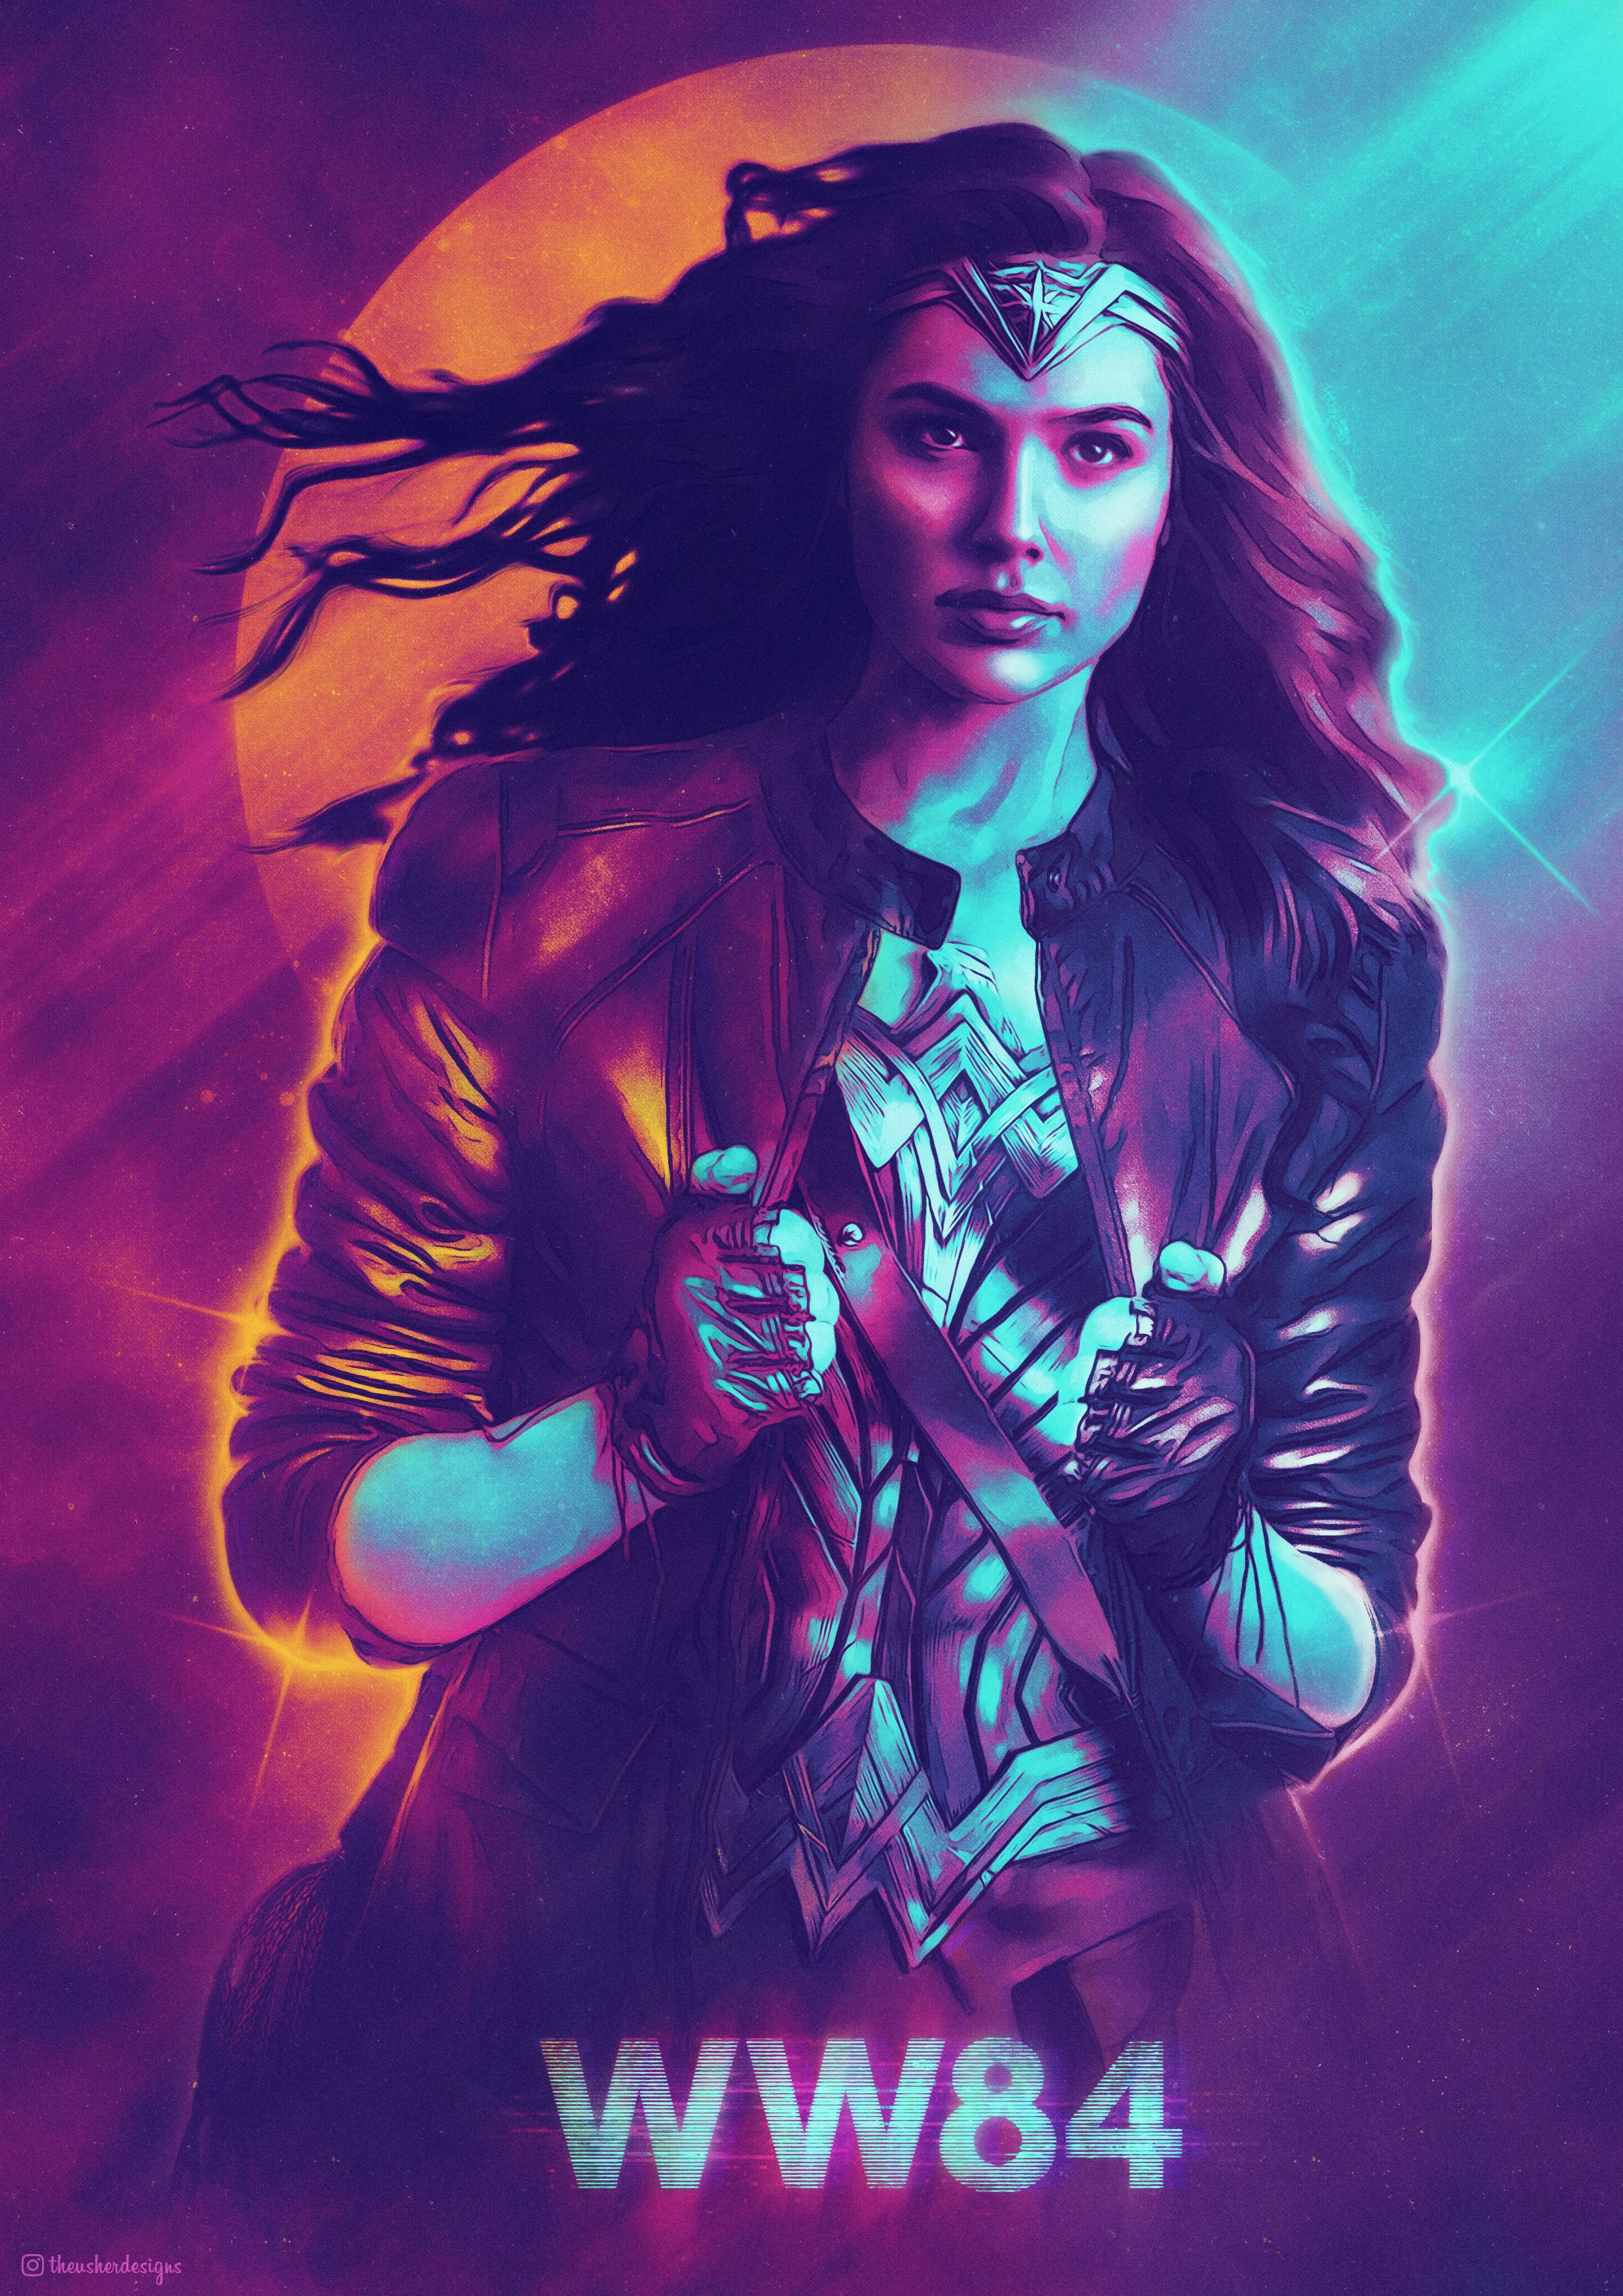 Watch Wonder Woman 1984 Online Free In 2020 Wonder Women Wonder Woman Kunst Wonder Woman